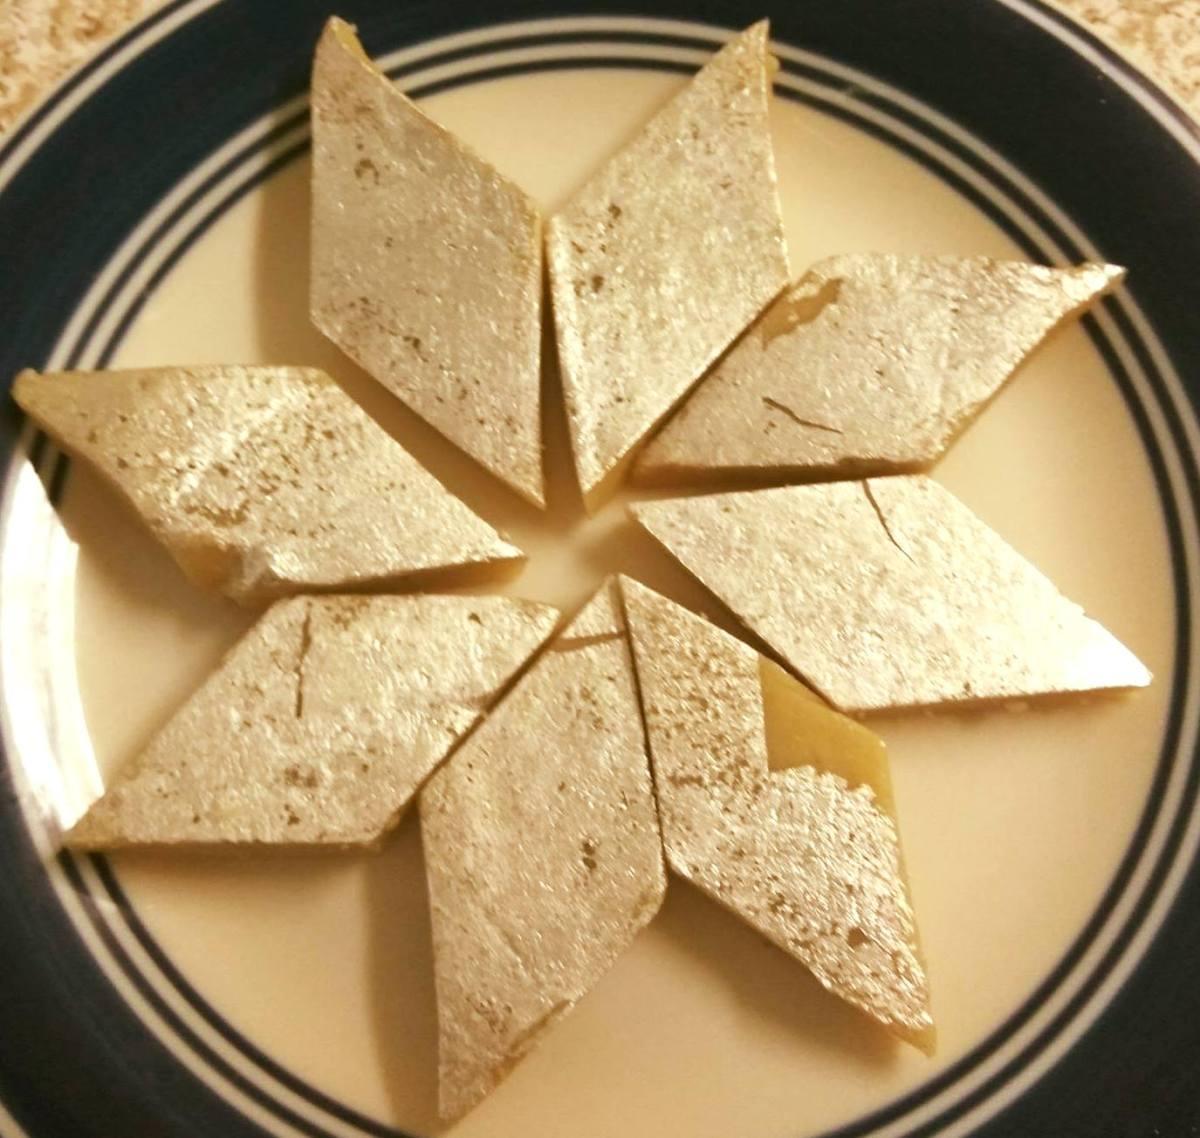 Recipe – Kaju Katli / Kaju Barfi / Cashew Sweets